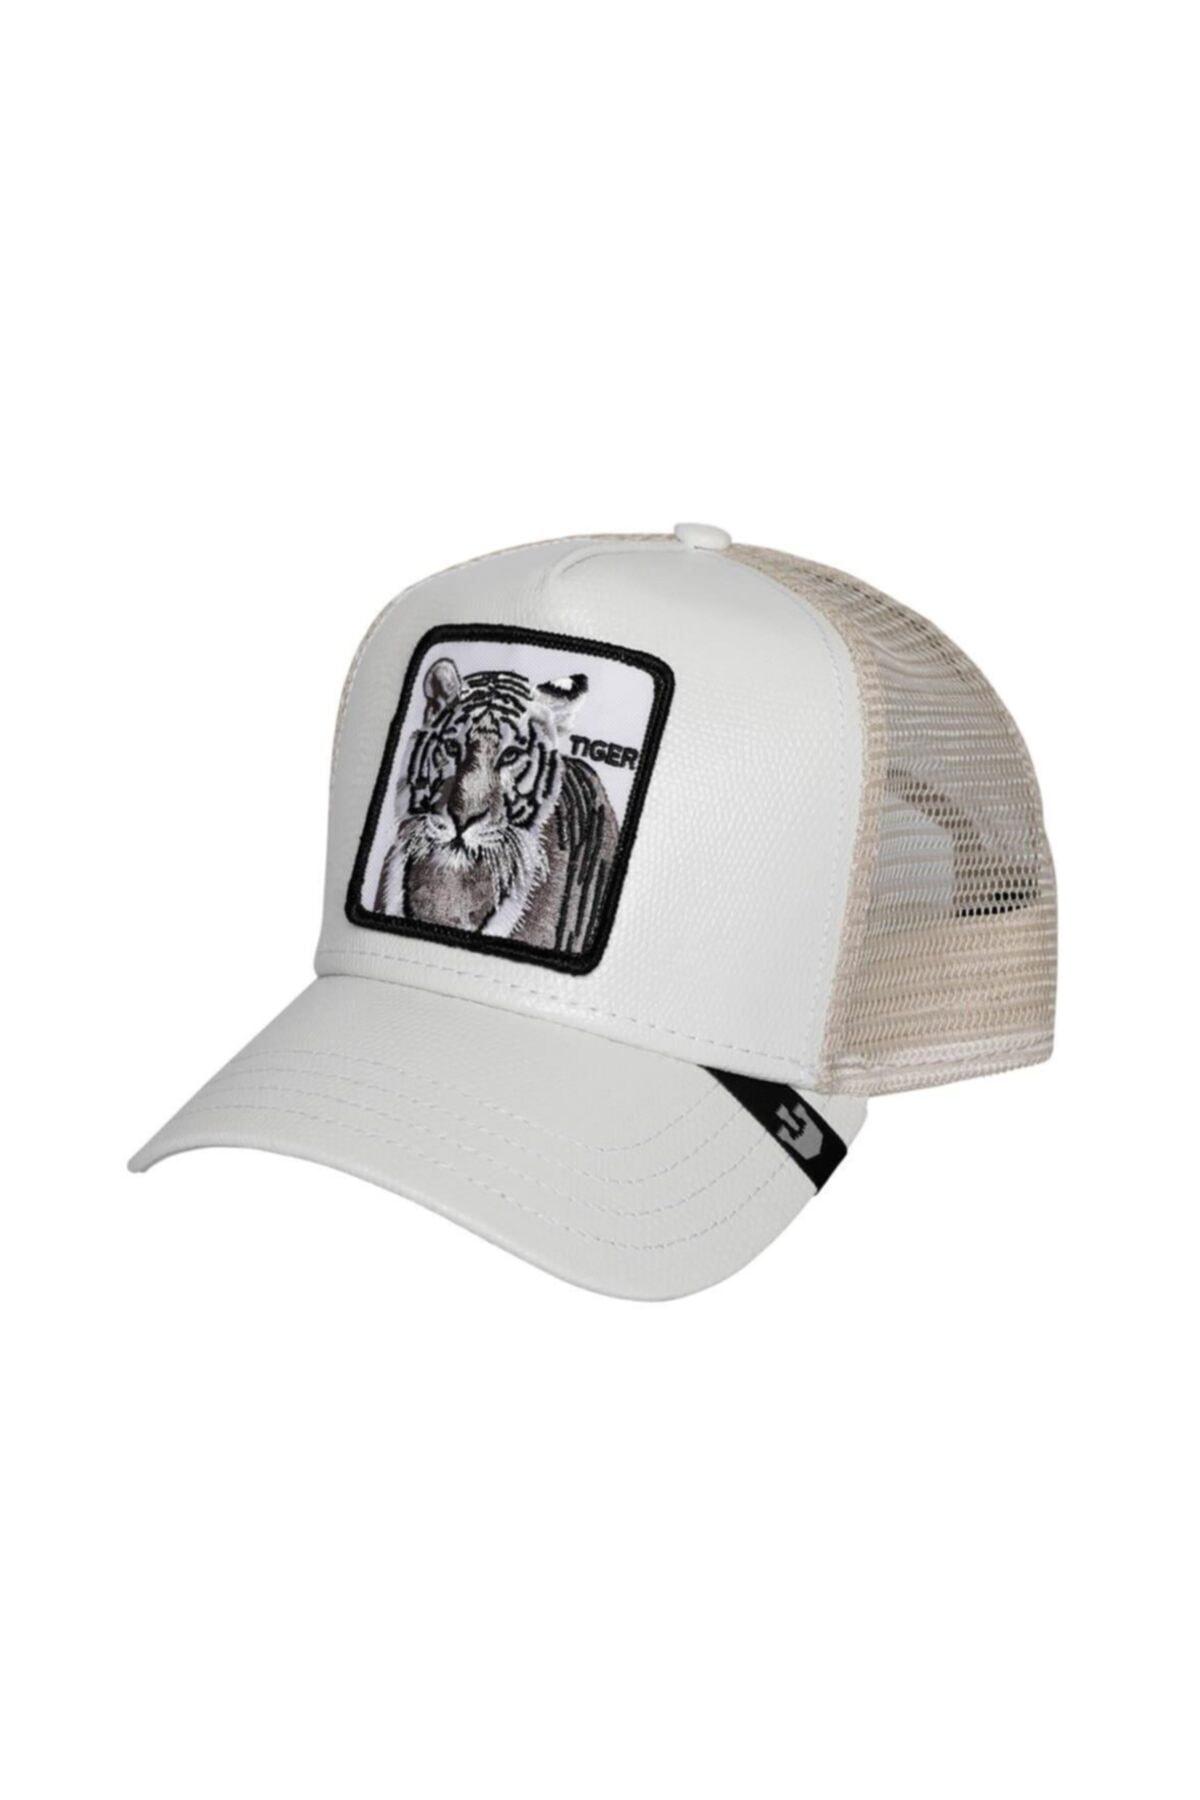 Goorin Bros Beyaz Killer Tiger Şapka 2